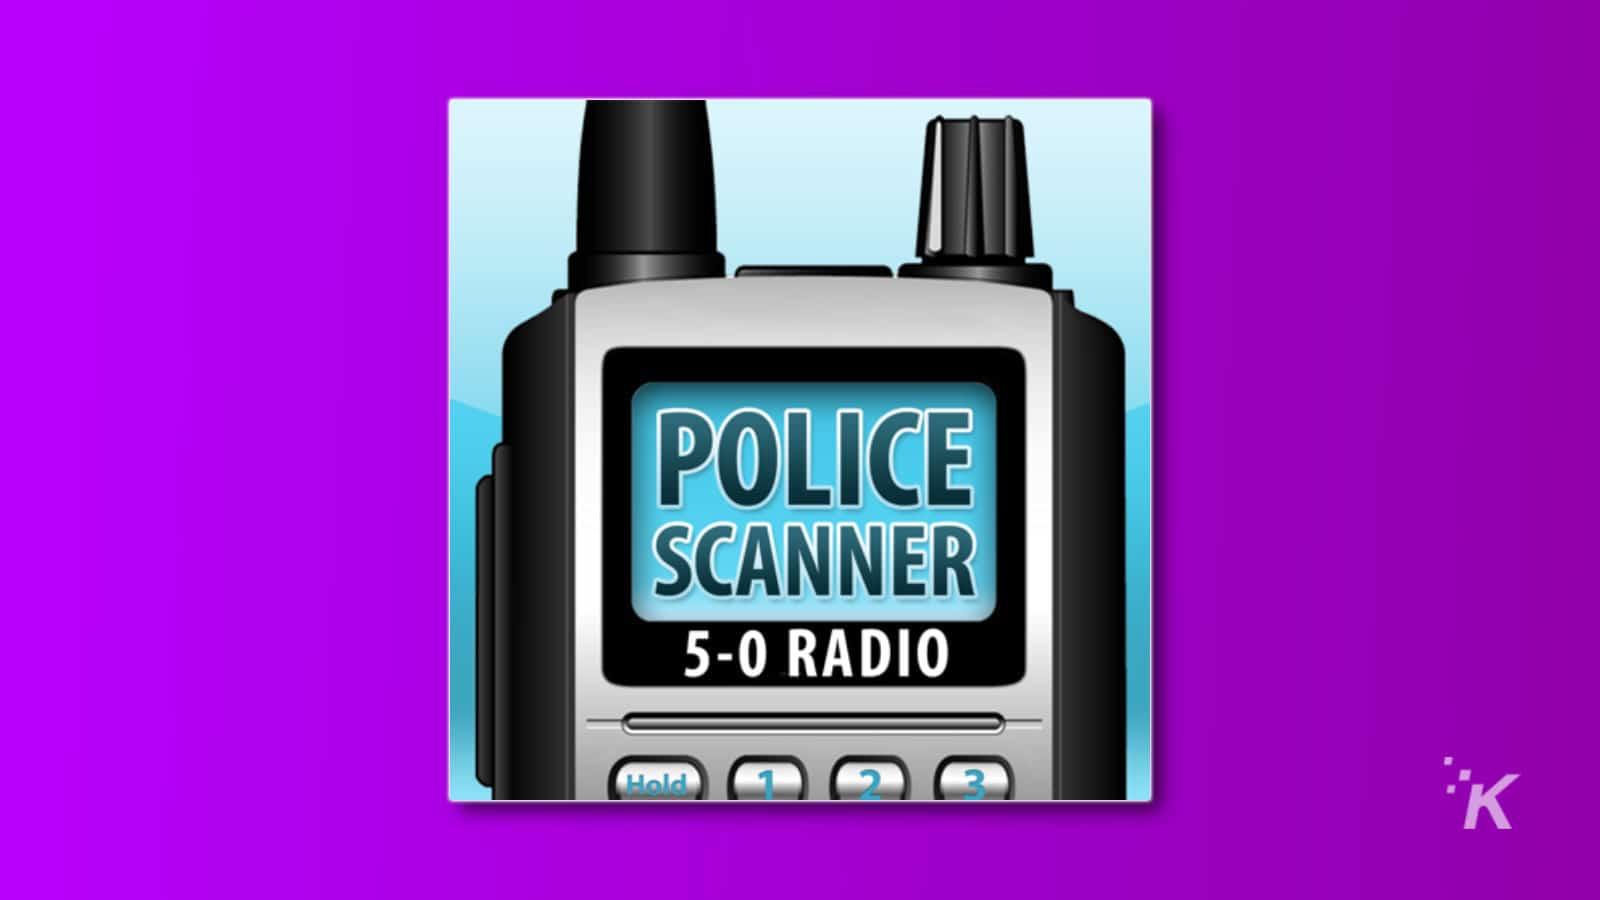 5-0 radio police scanner ios